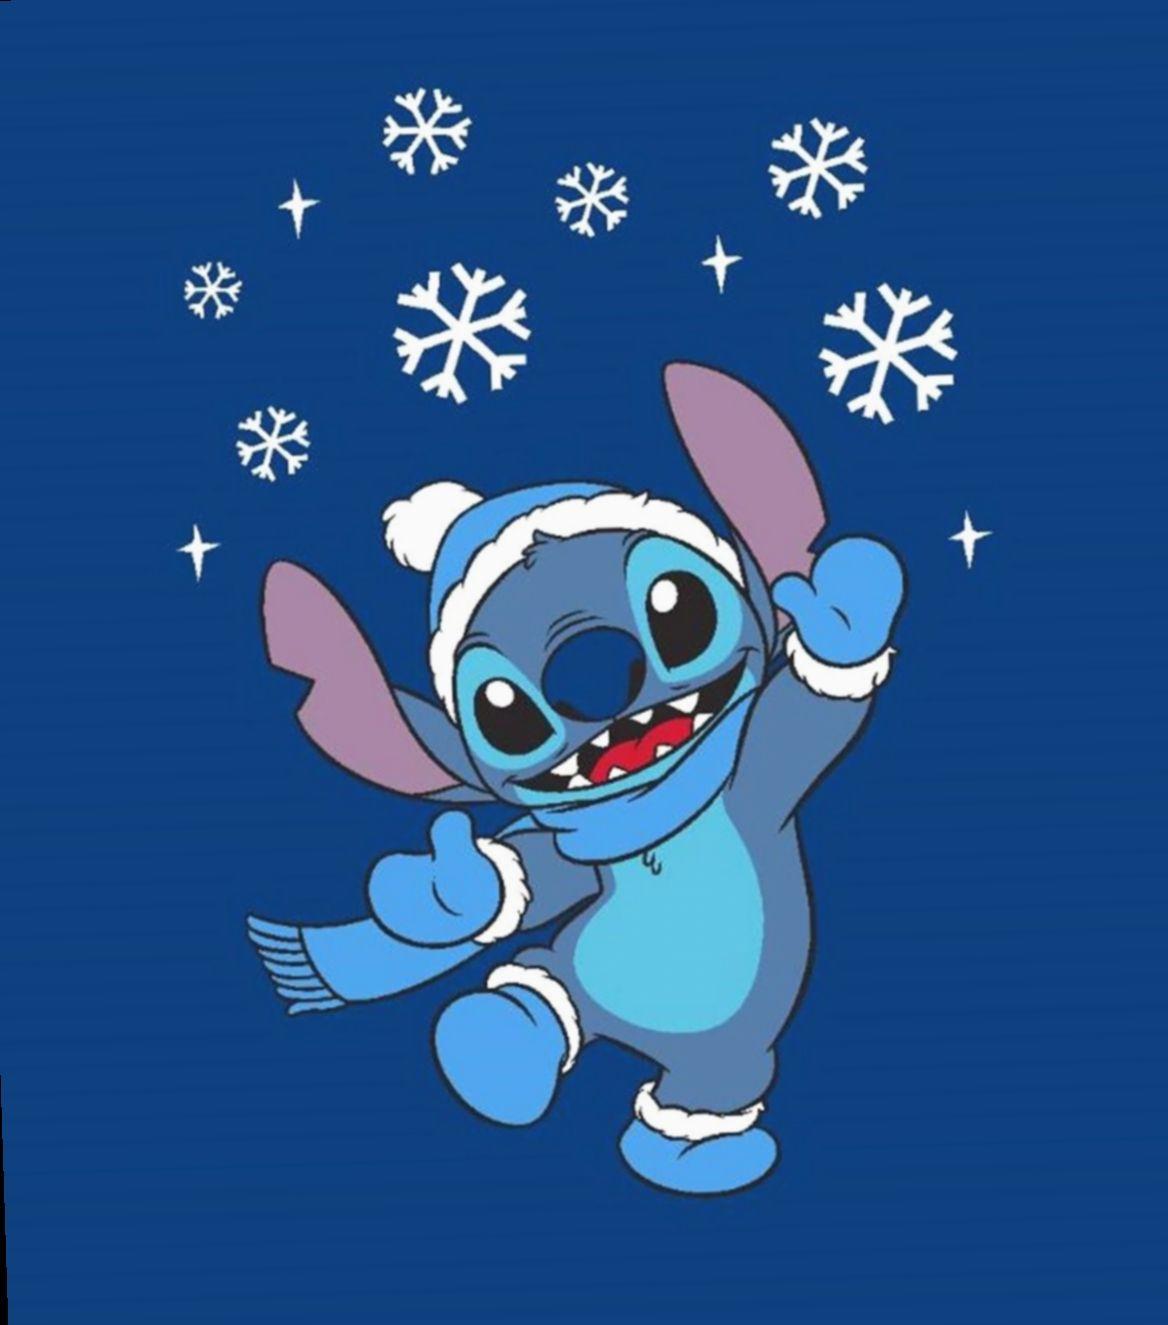 11 Wallpaper Ipad Disney Stitch Stitch Drawing Lilo And Stitch Cute Christmas Wallpaper